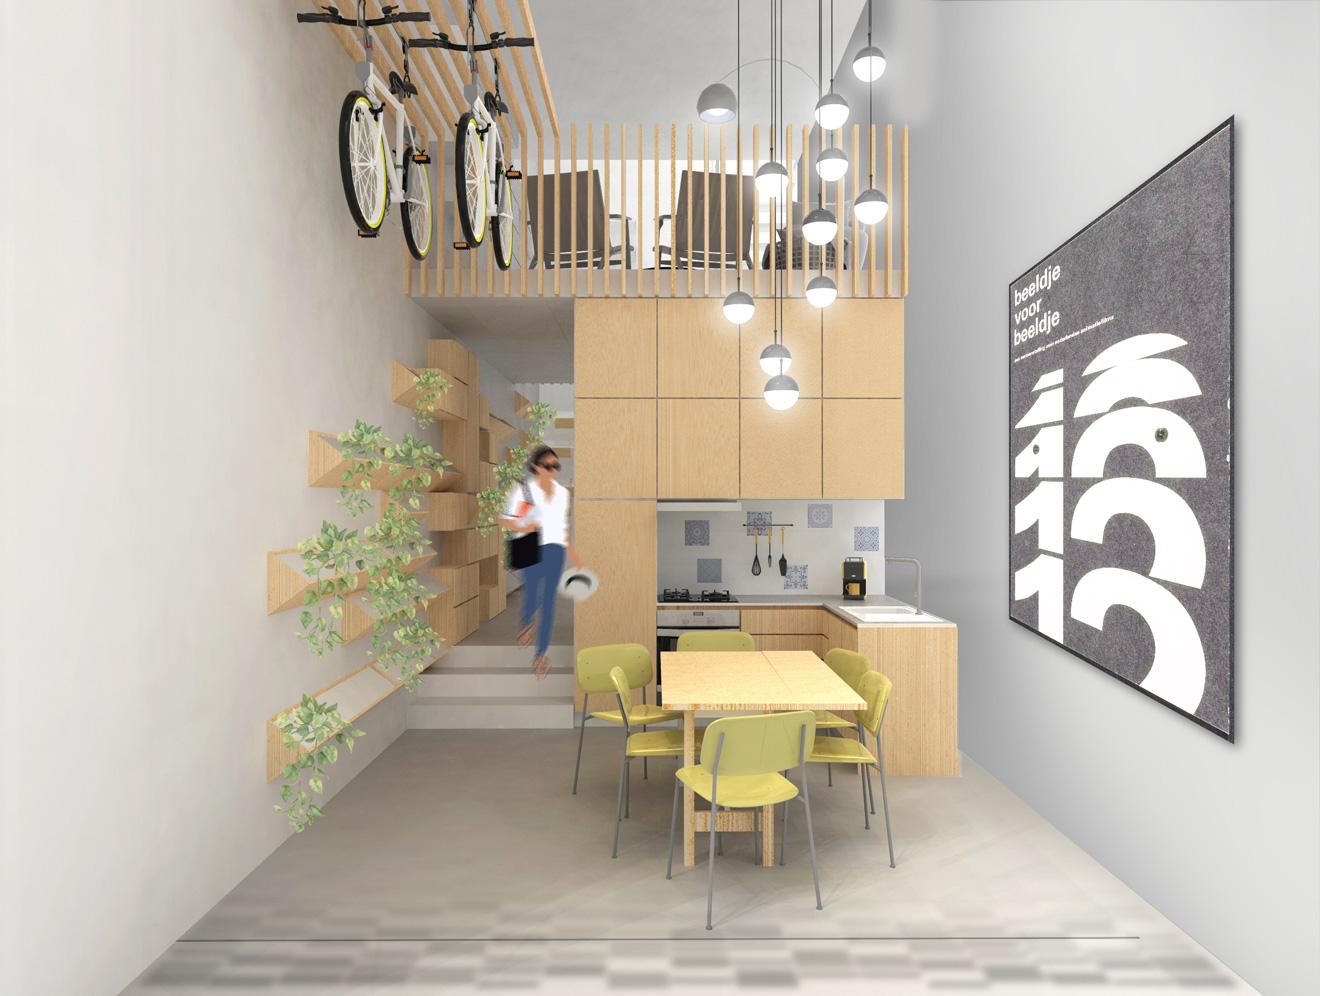 amsterdam residential house home renovation akka architects